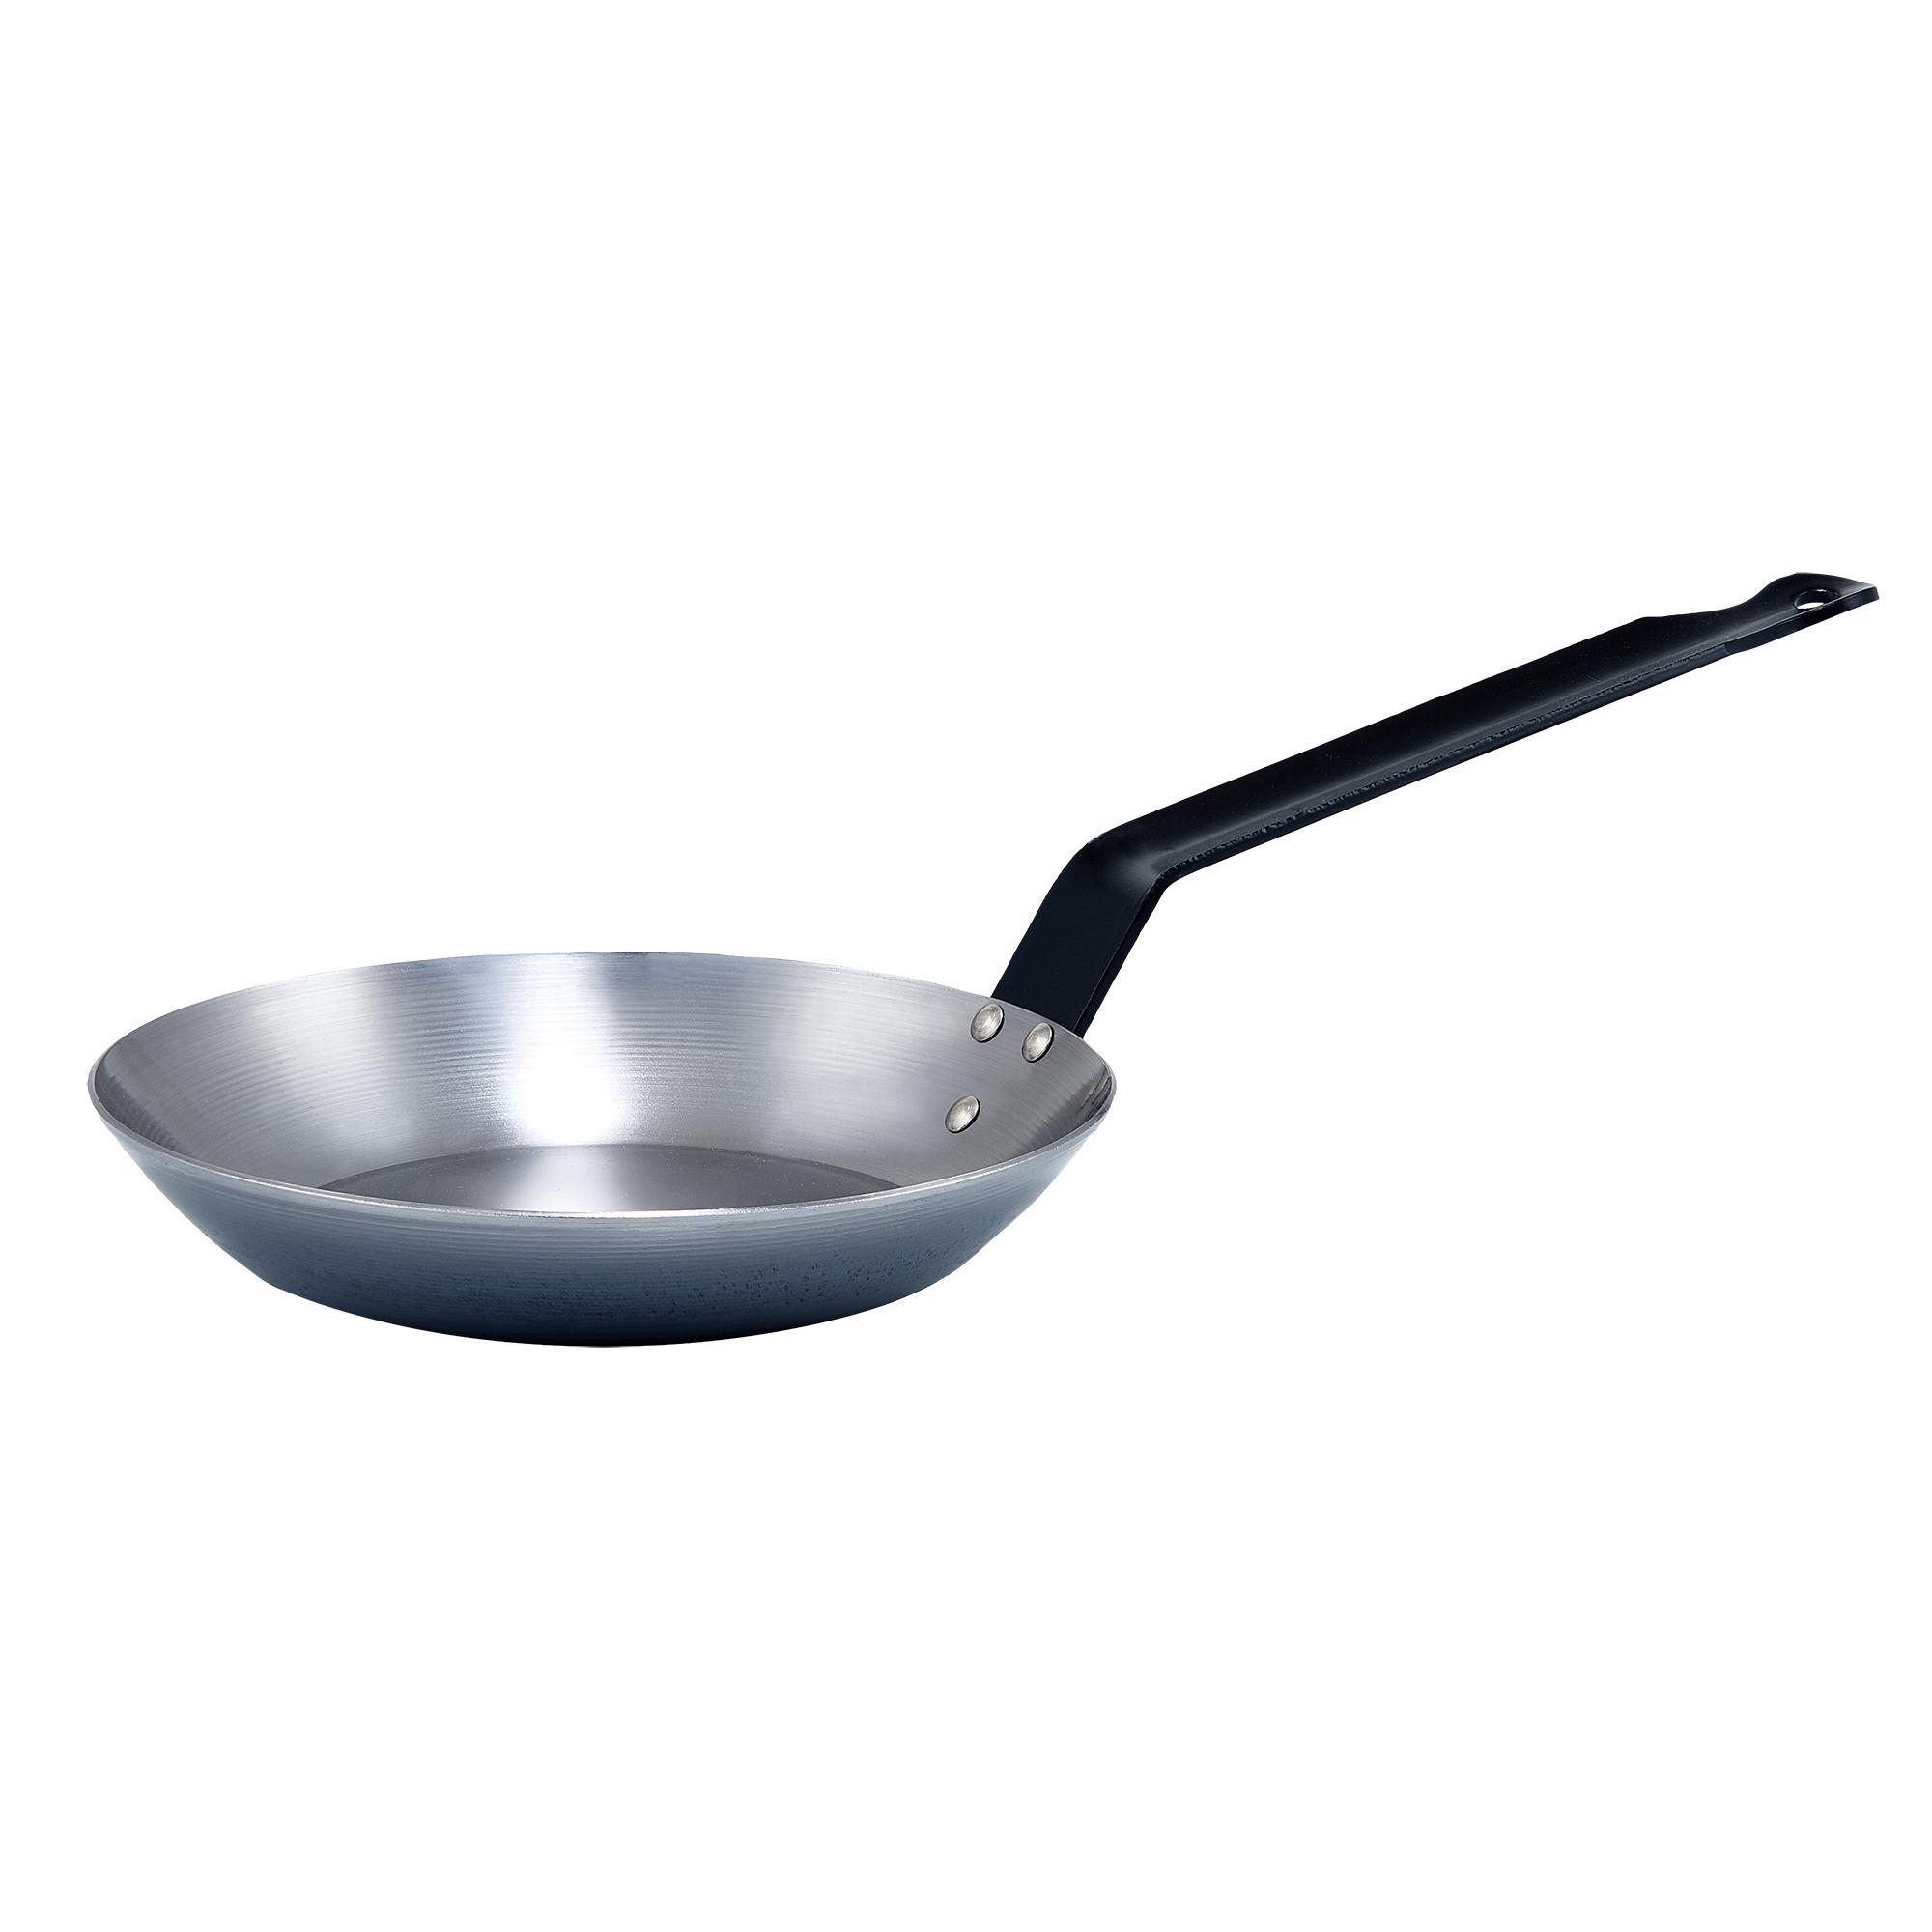 Winco CSFP-7 fry pan